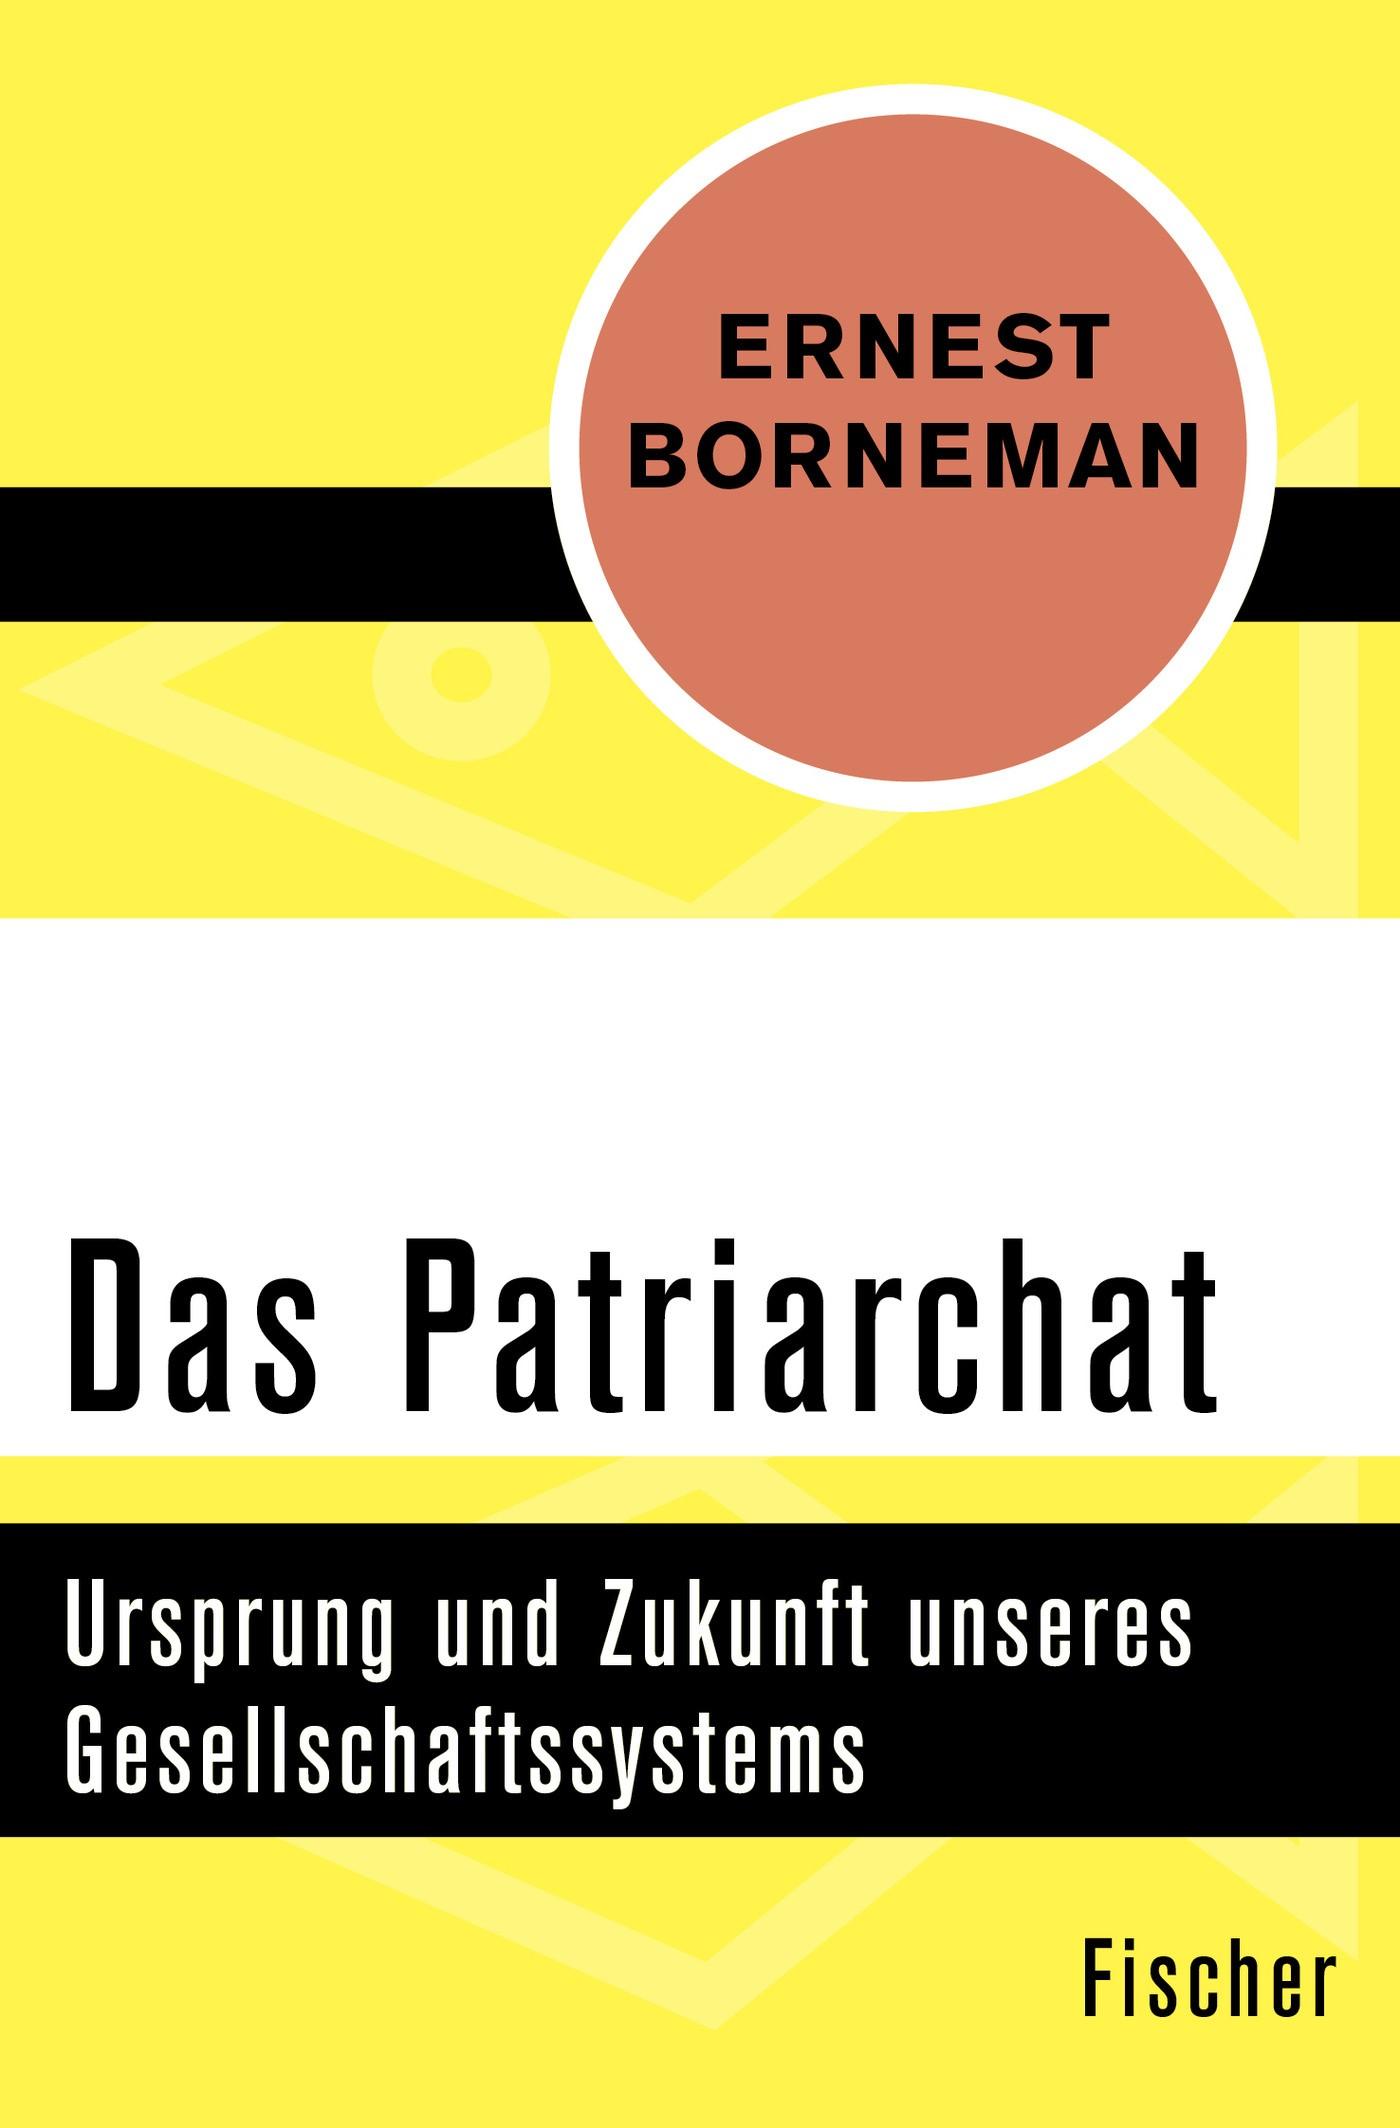 Das Patriarchat | Borneman, 2015 | Buch (Cover)